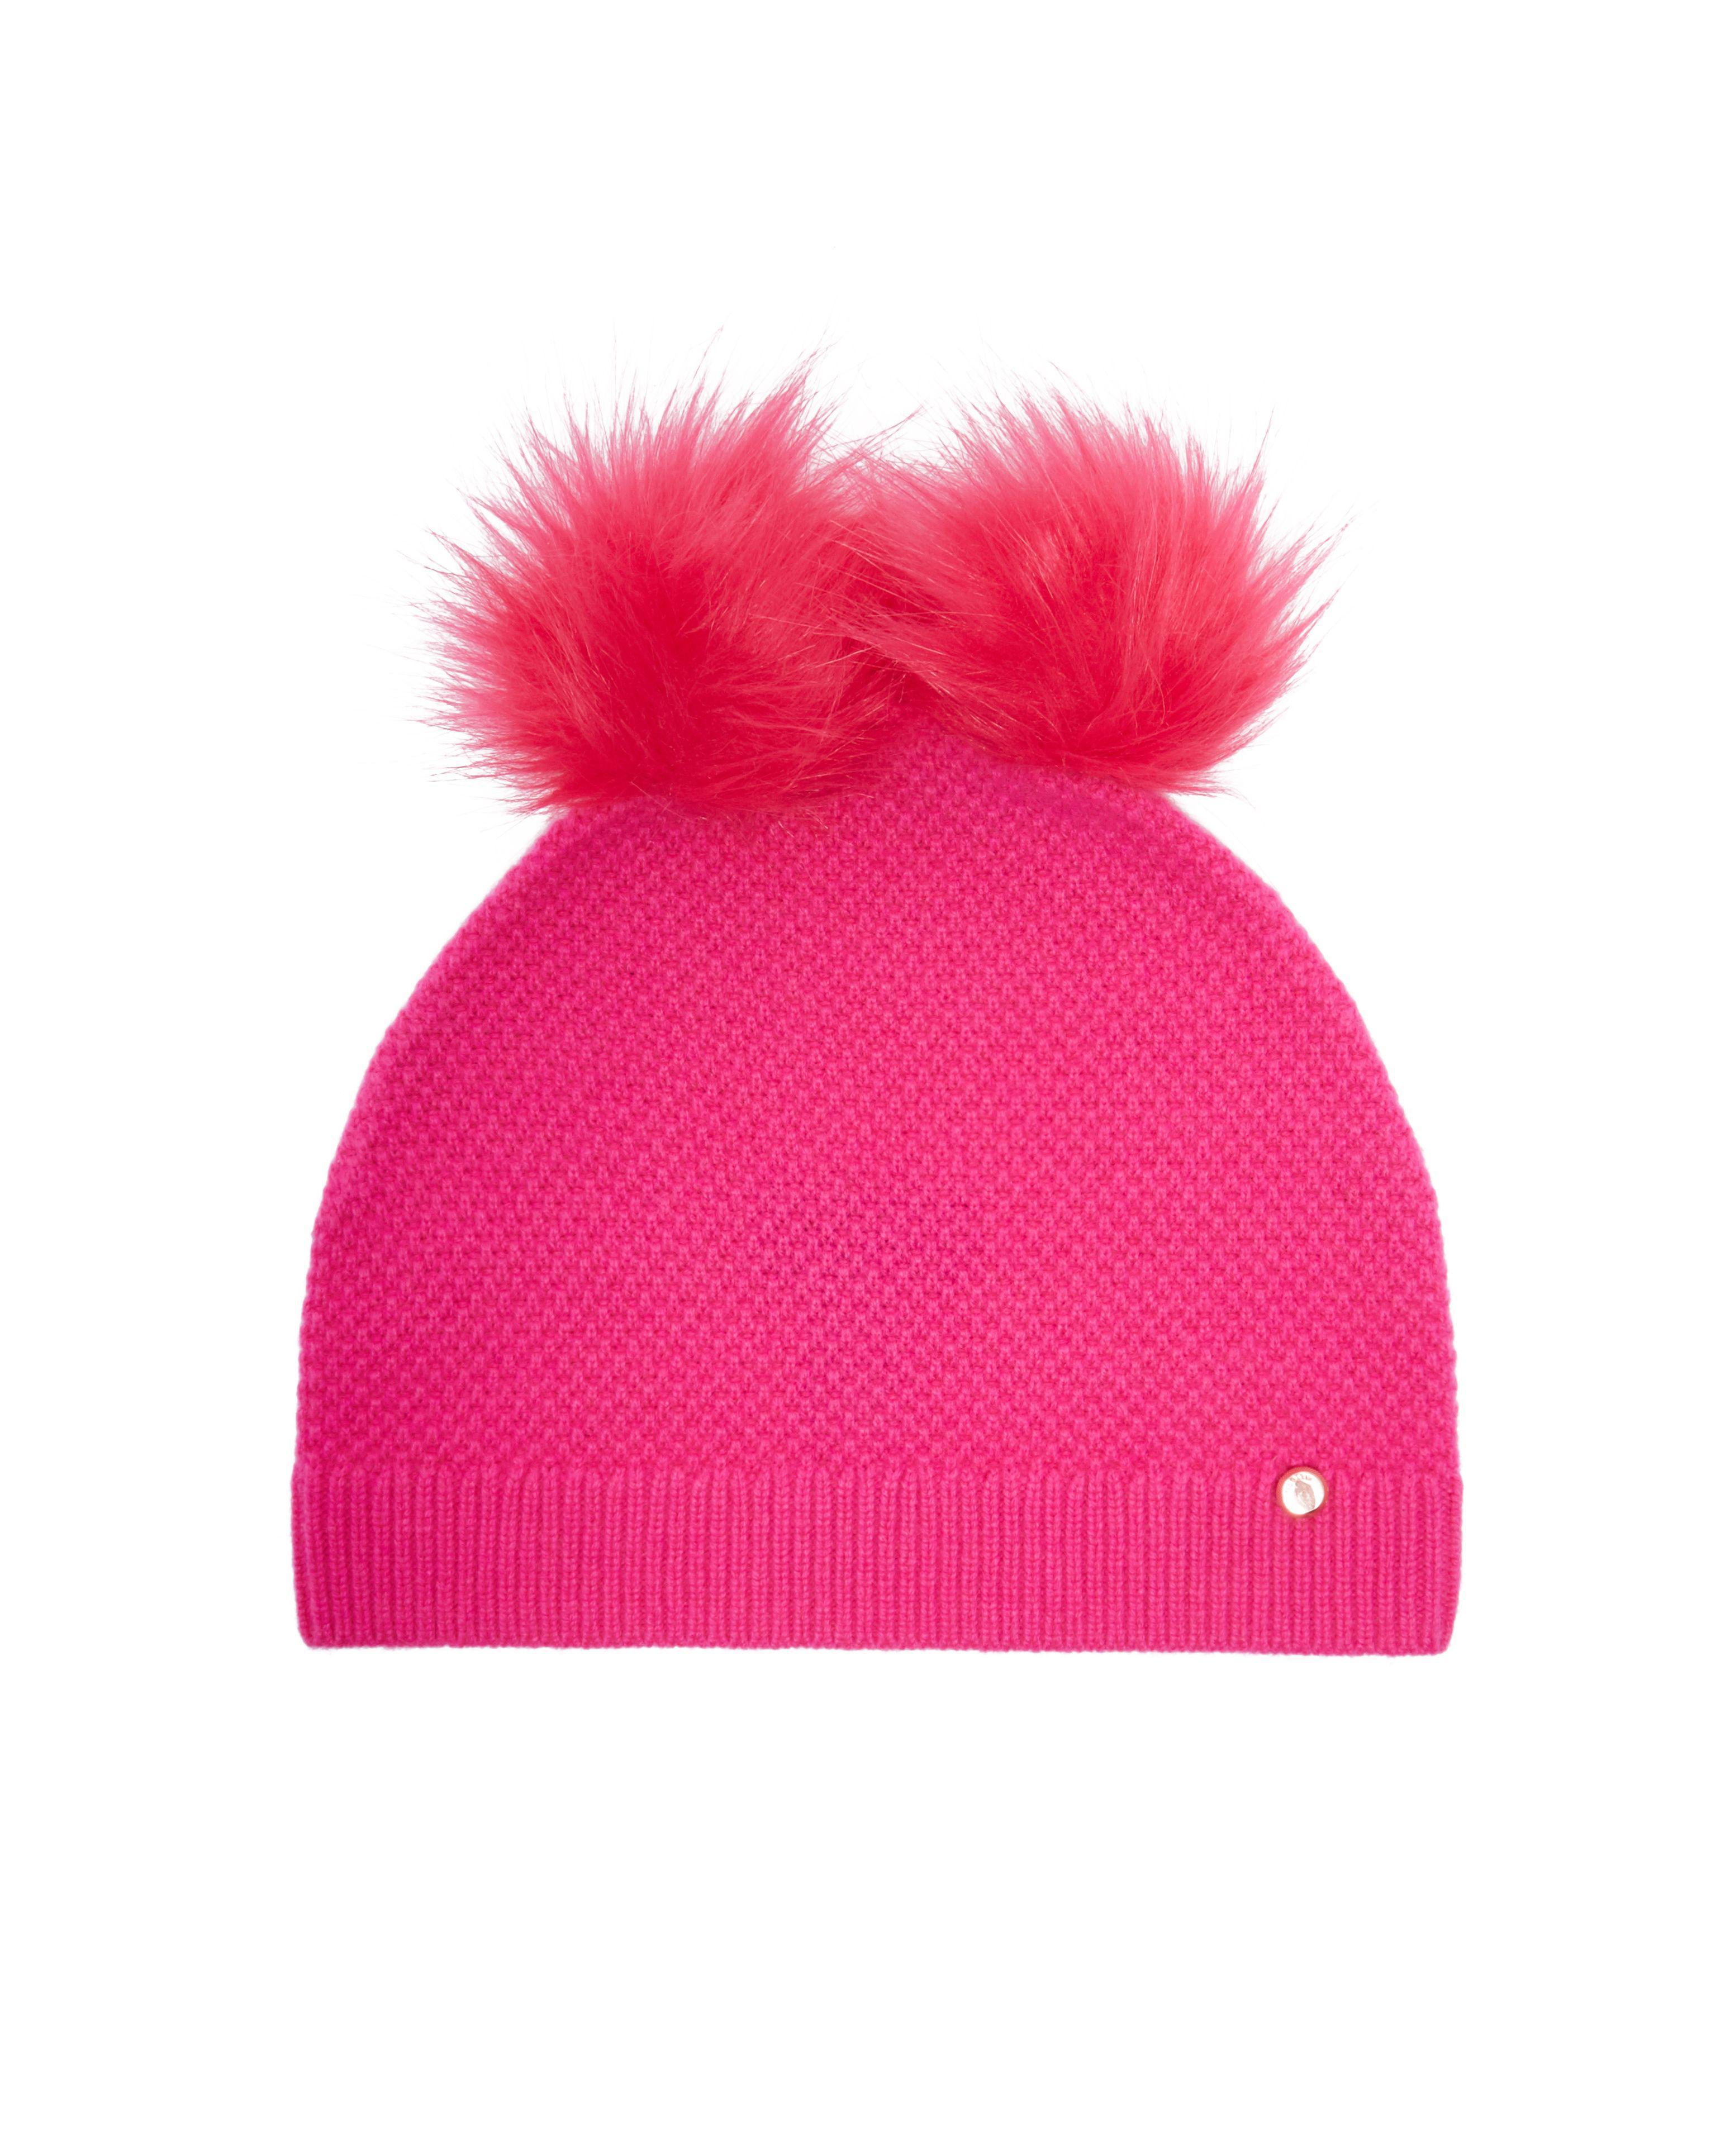 ba009472088 Ted Baker Inita Double Pom-pom Hat in Pink - Lyst